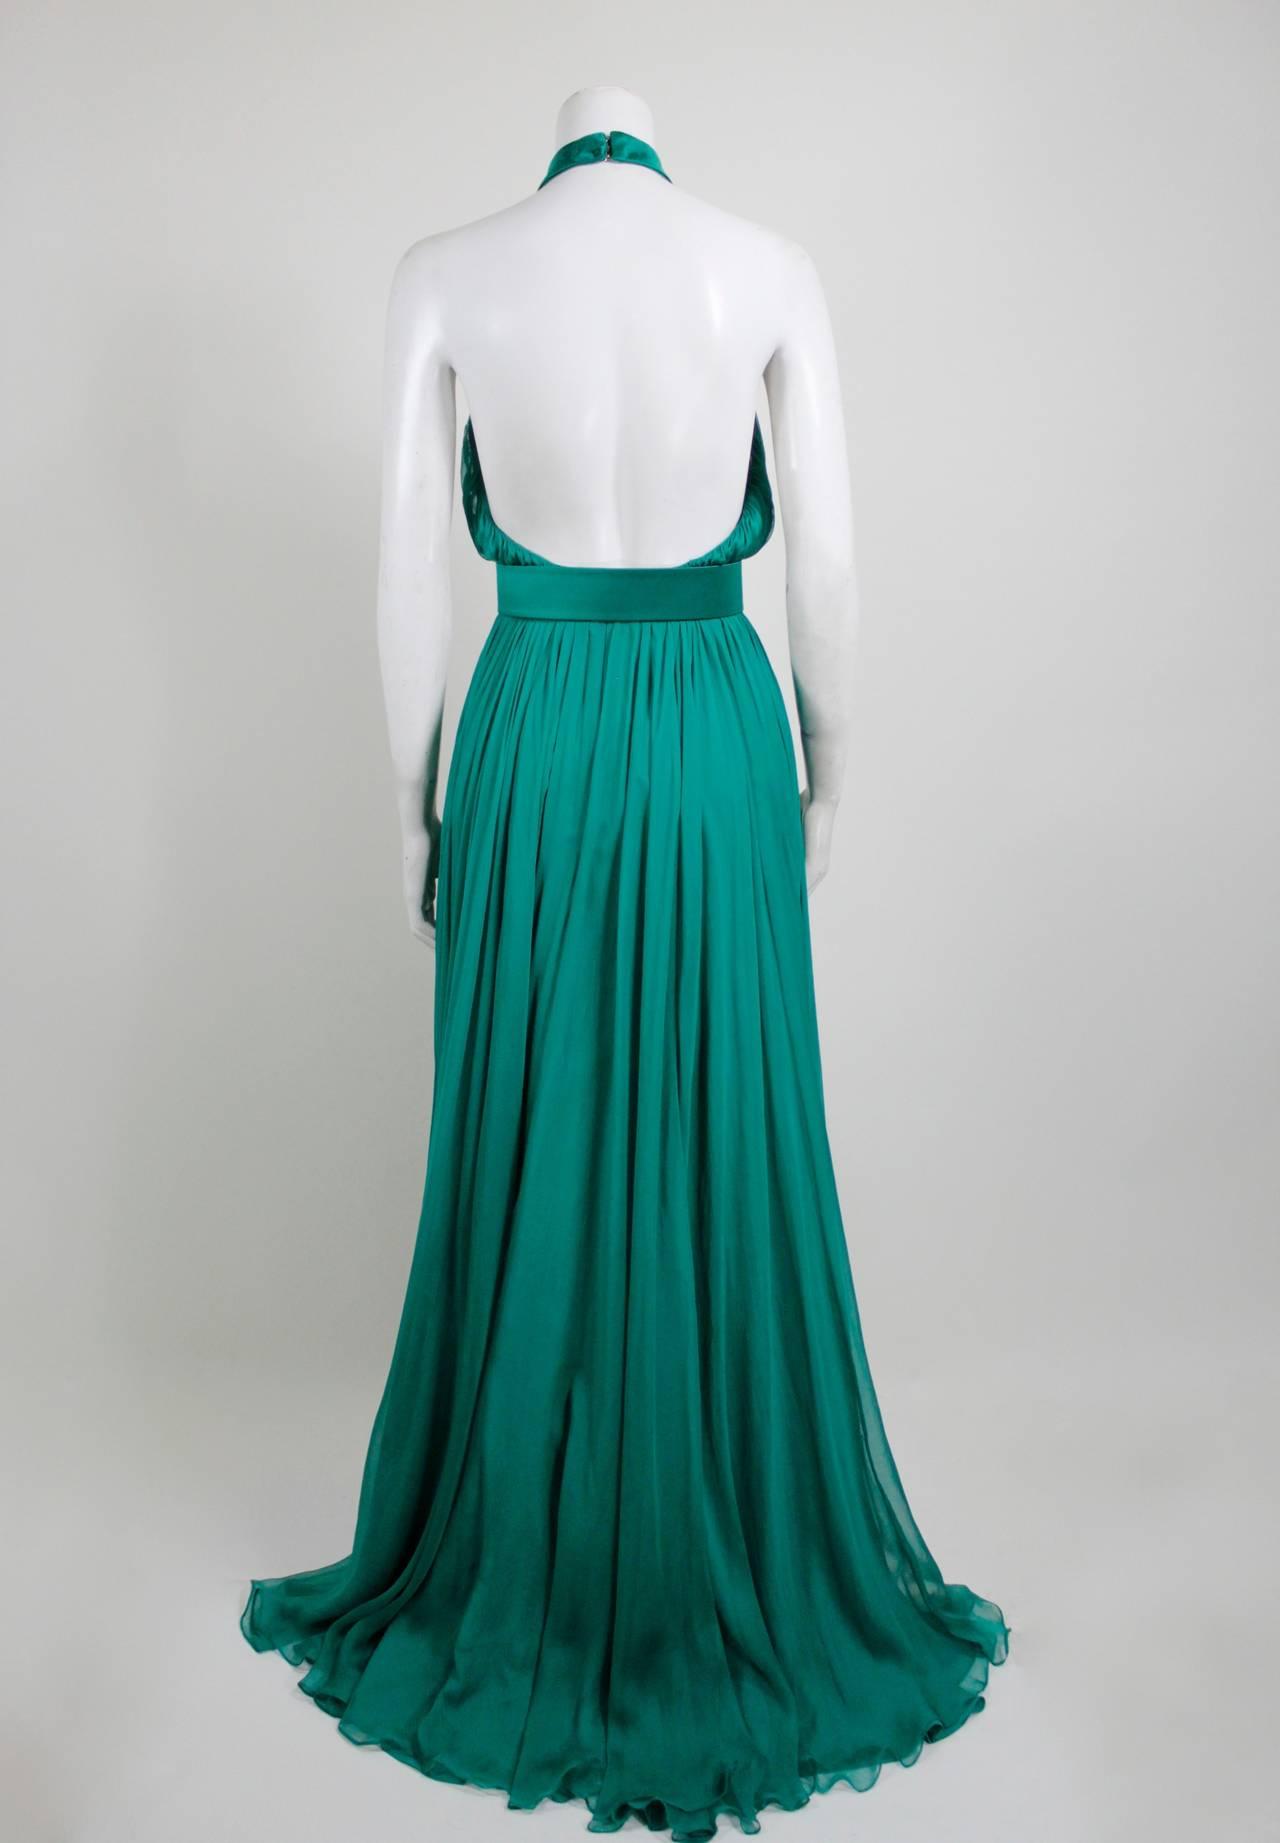 Alexander McQueen 2010 Flowing Emerald Green Chiffon Halter Gown with Belt 6